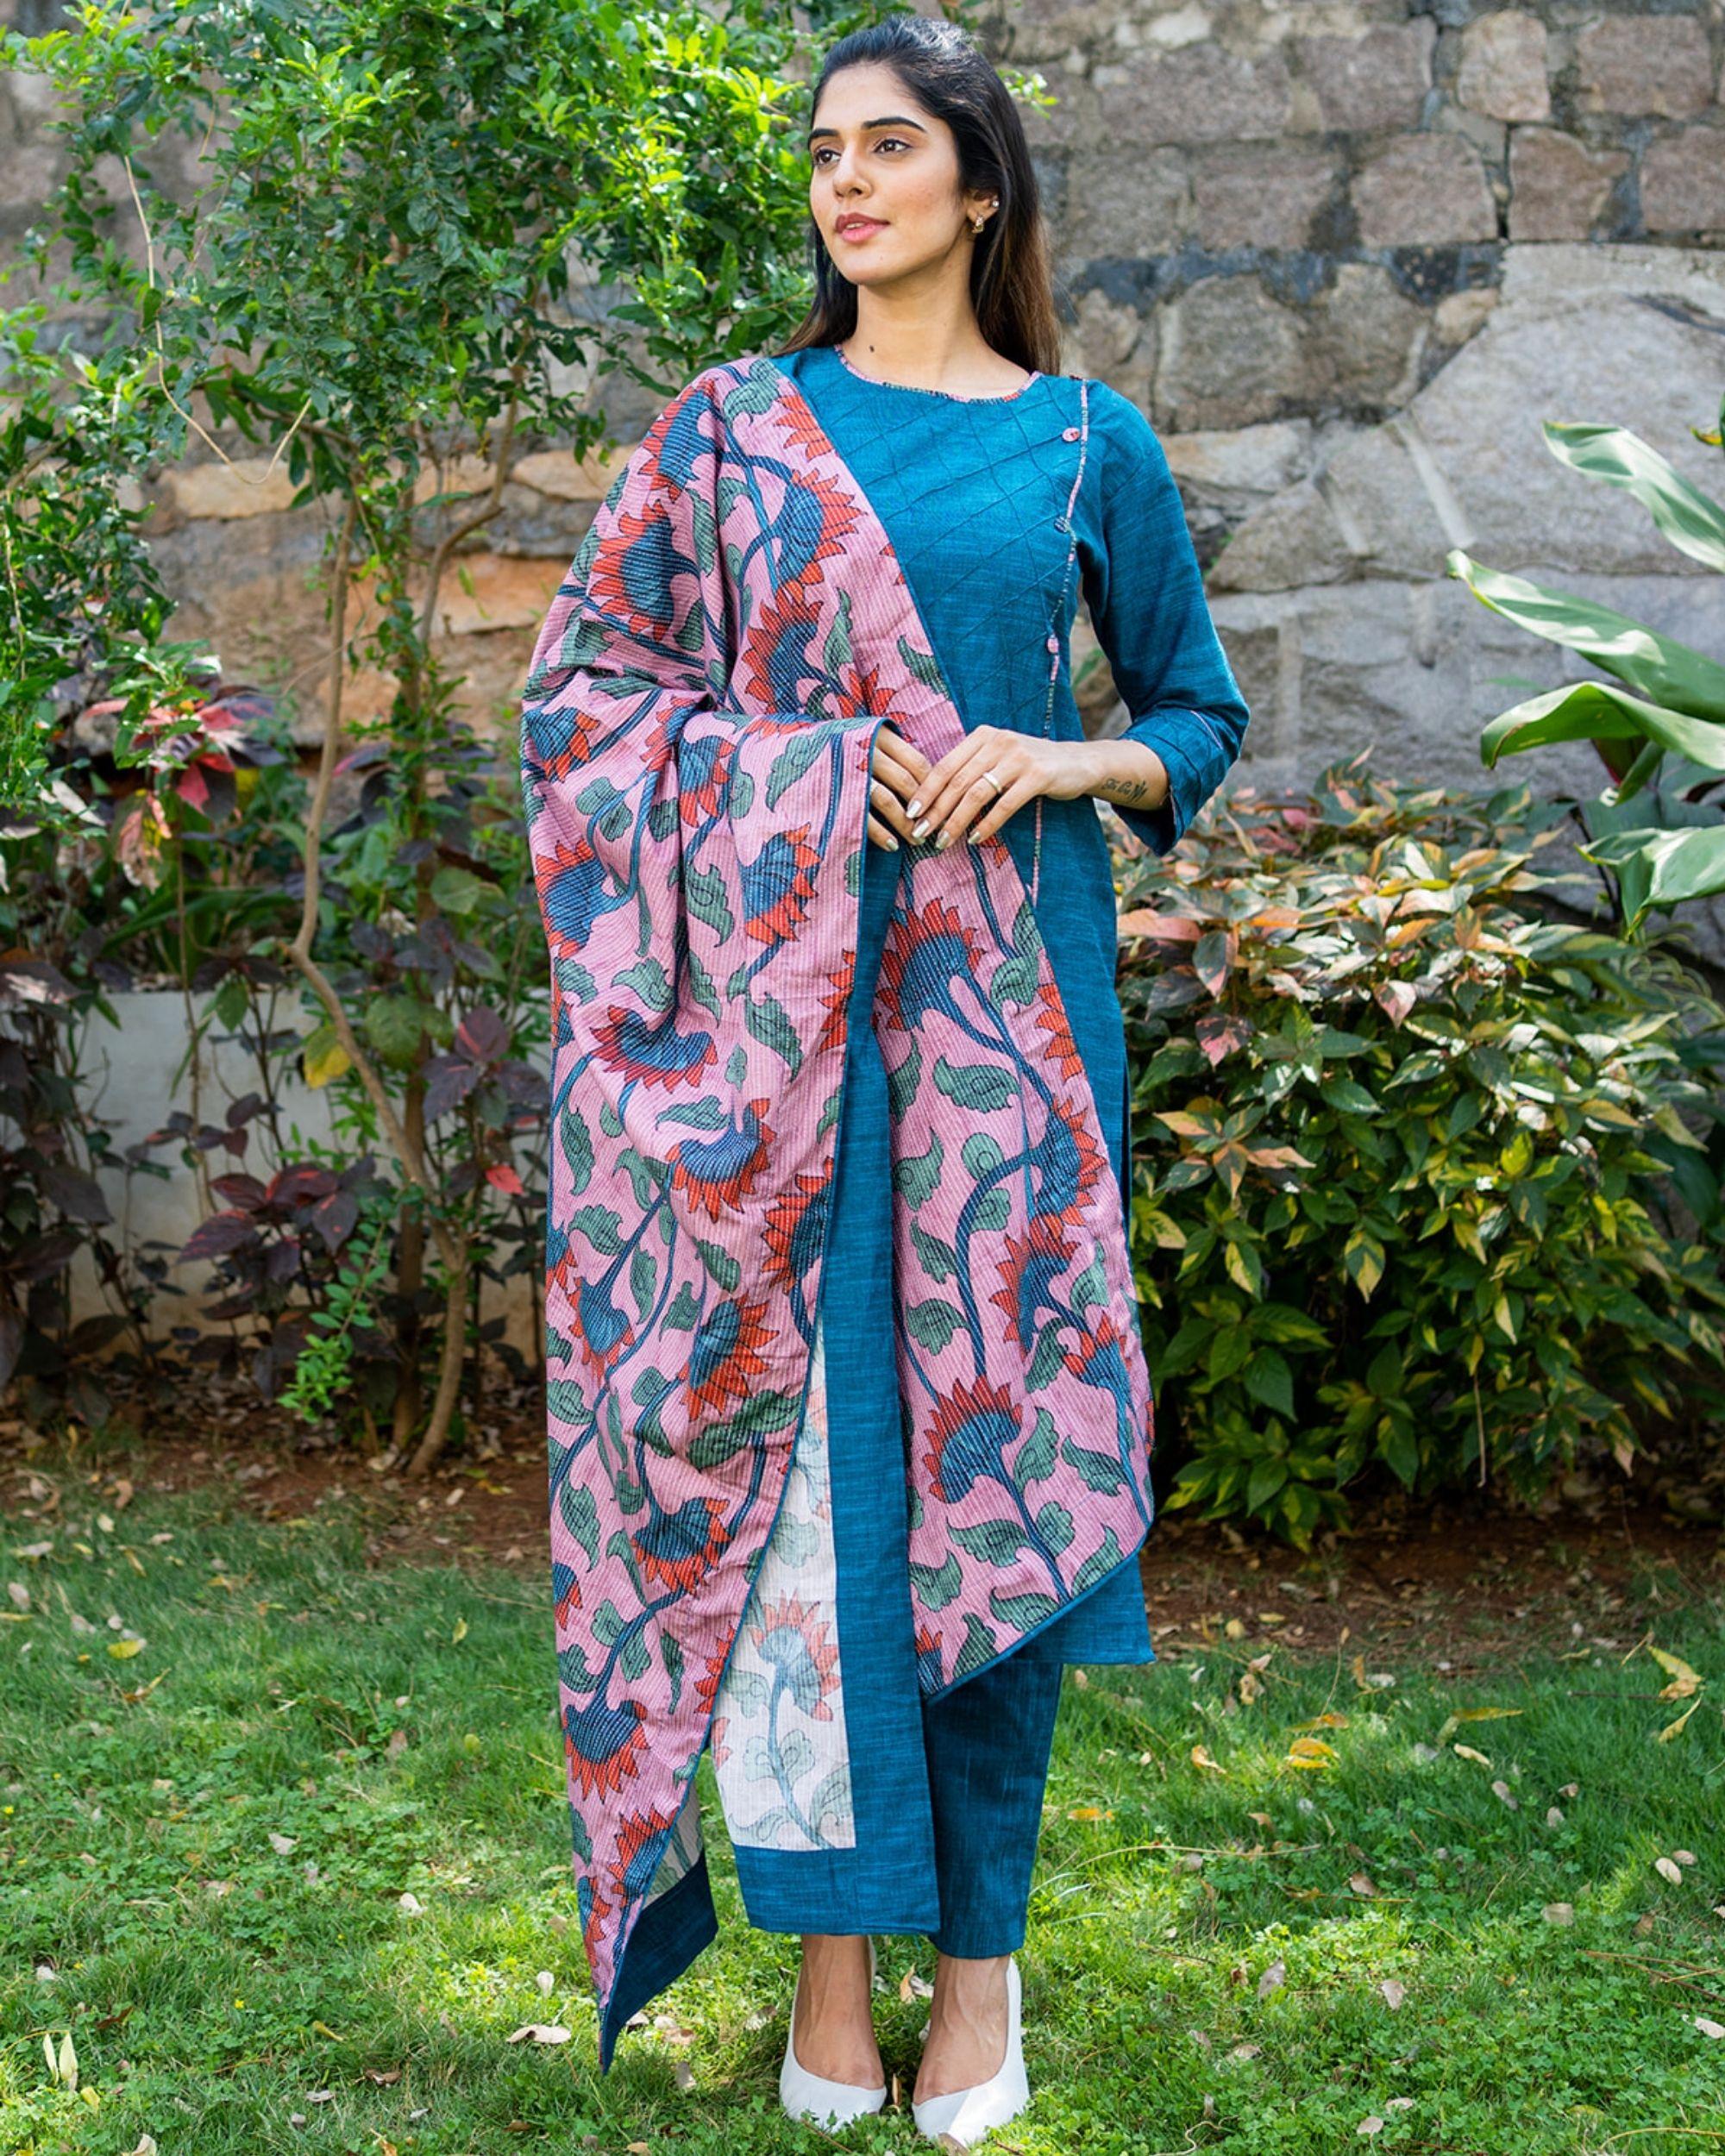 Peacock blue kurta and pants with printed kalamkari dupatta - set of three